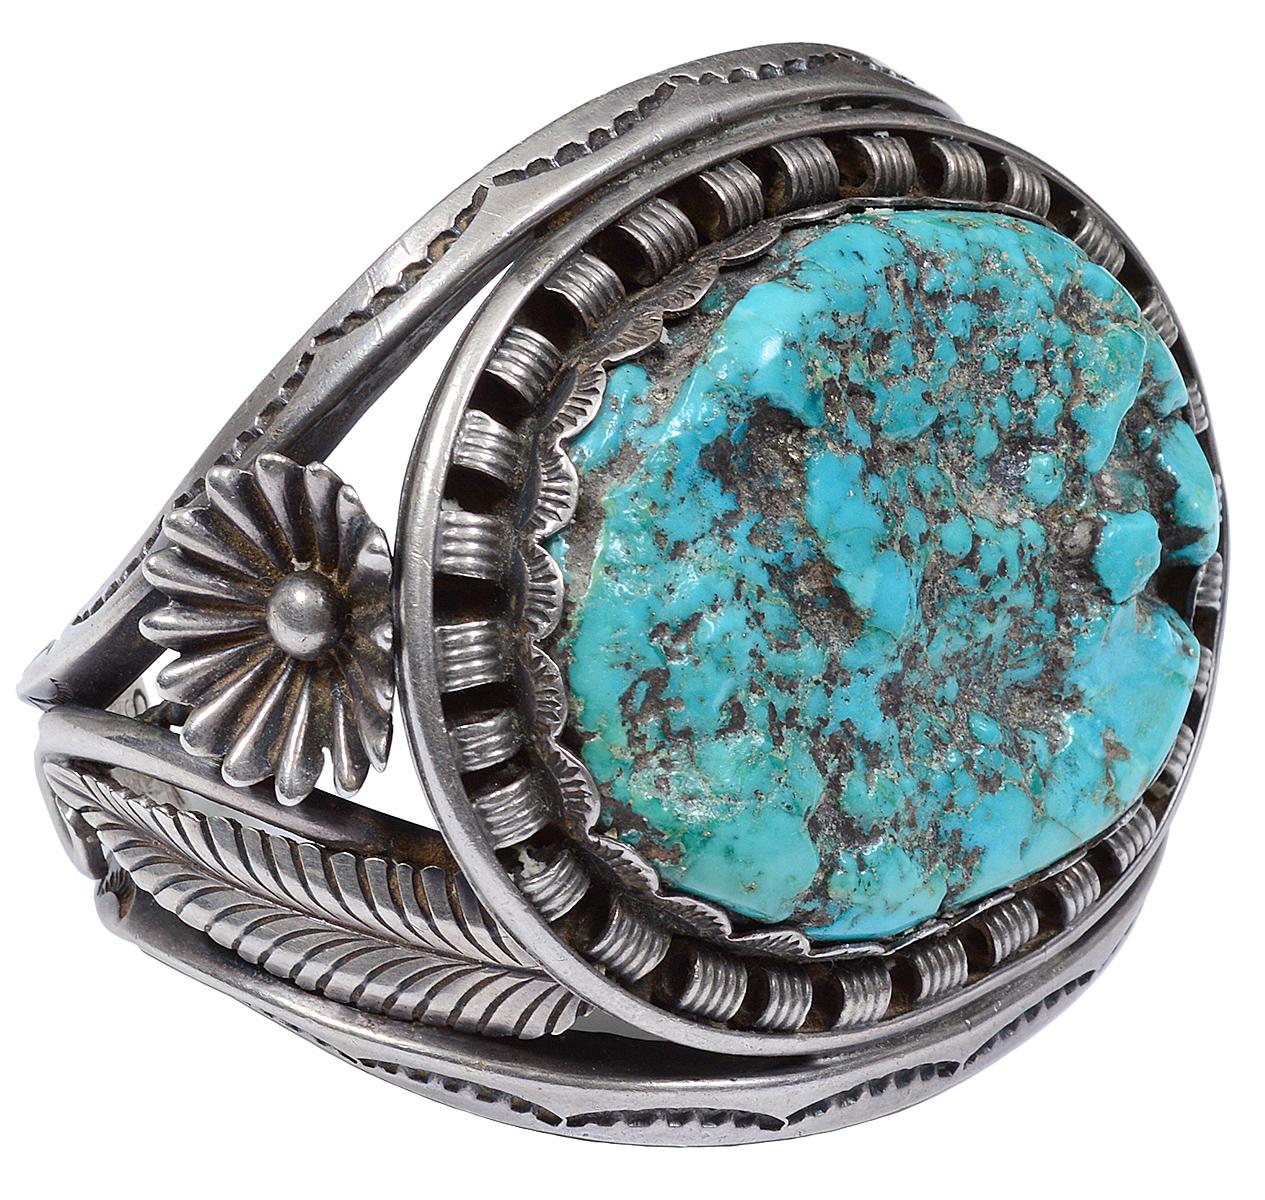 Native-American sterling silver old pawn cuff bracelet. initialed 'KS.' Estate of Edward Stuart Cohen. AGOPB image